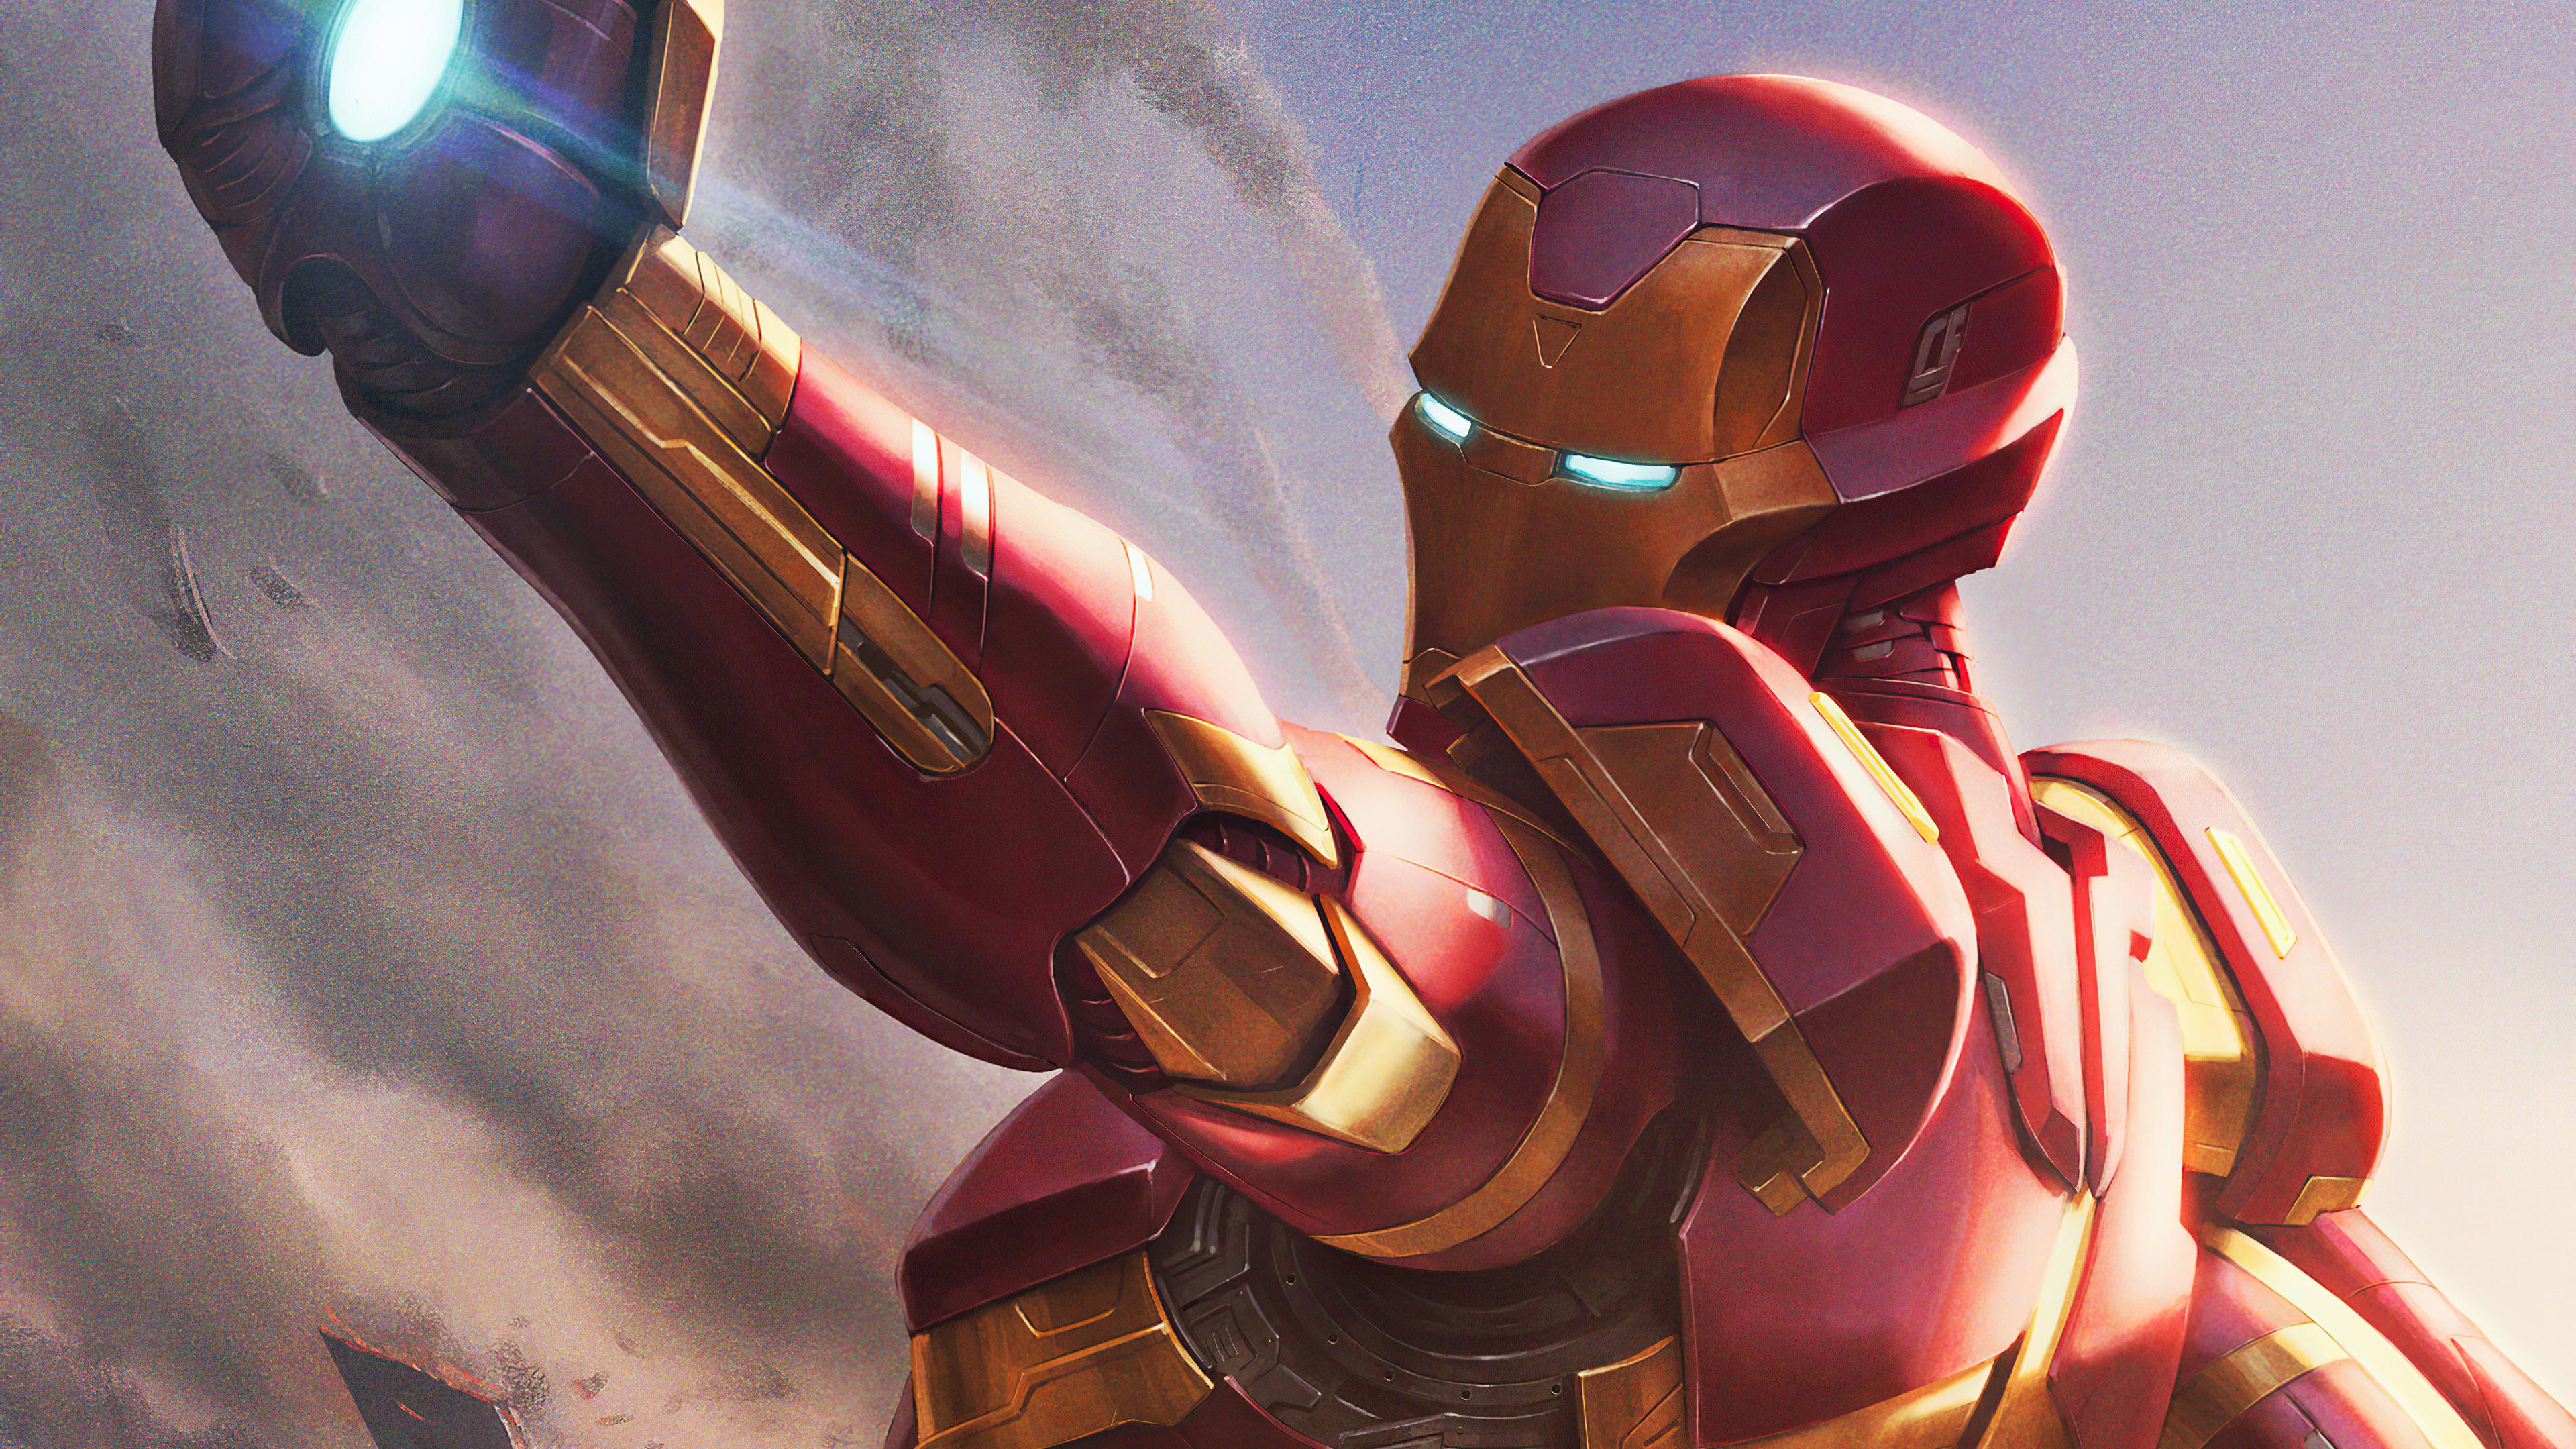 iron man ready artwork 1596915495 - Iron Man Ready Artwork -